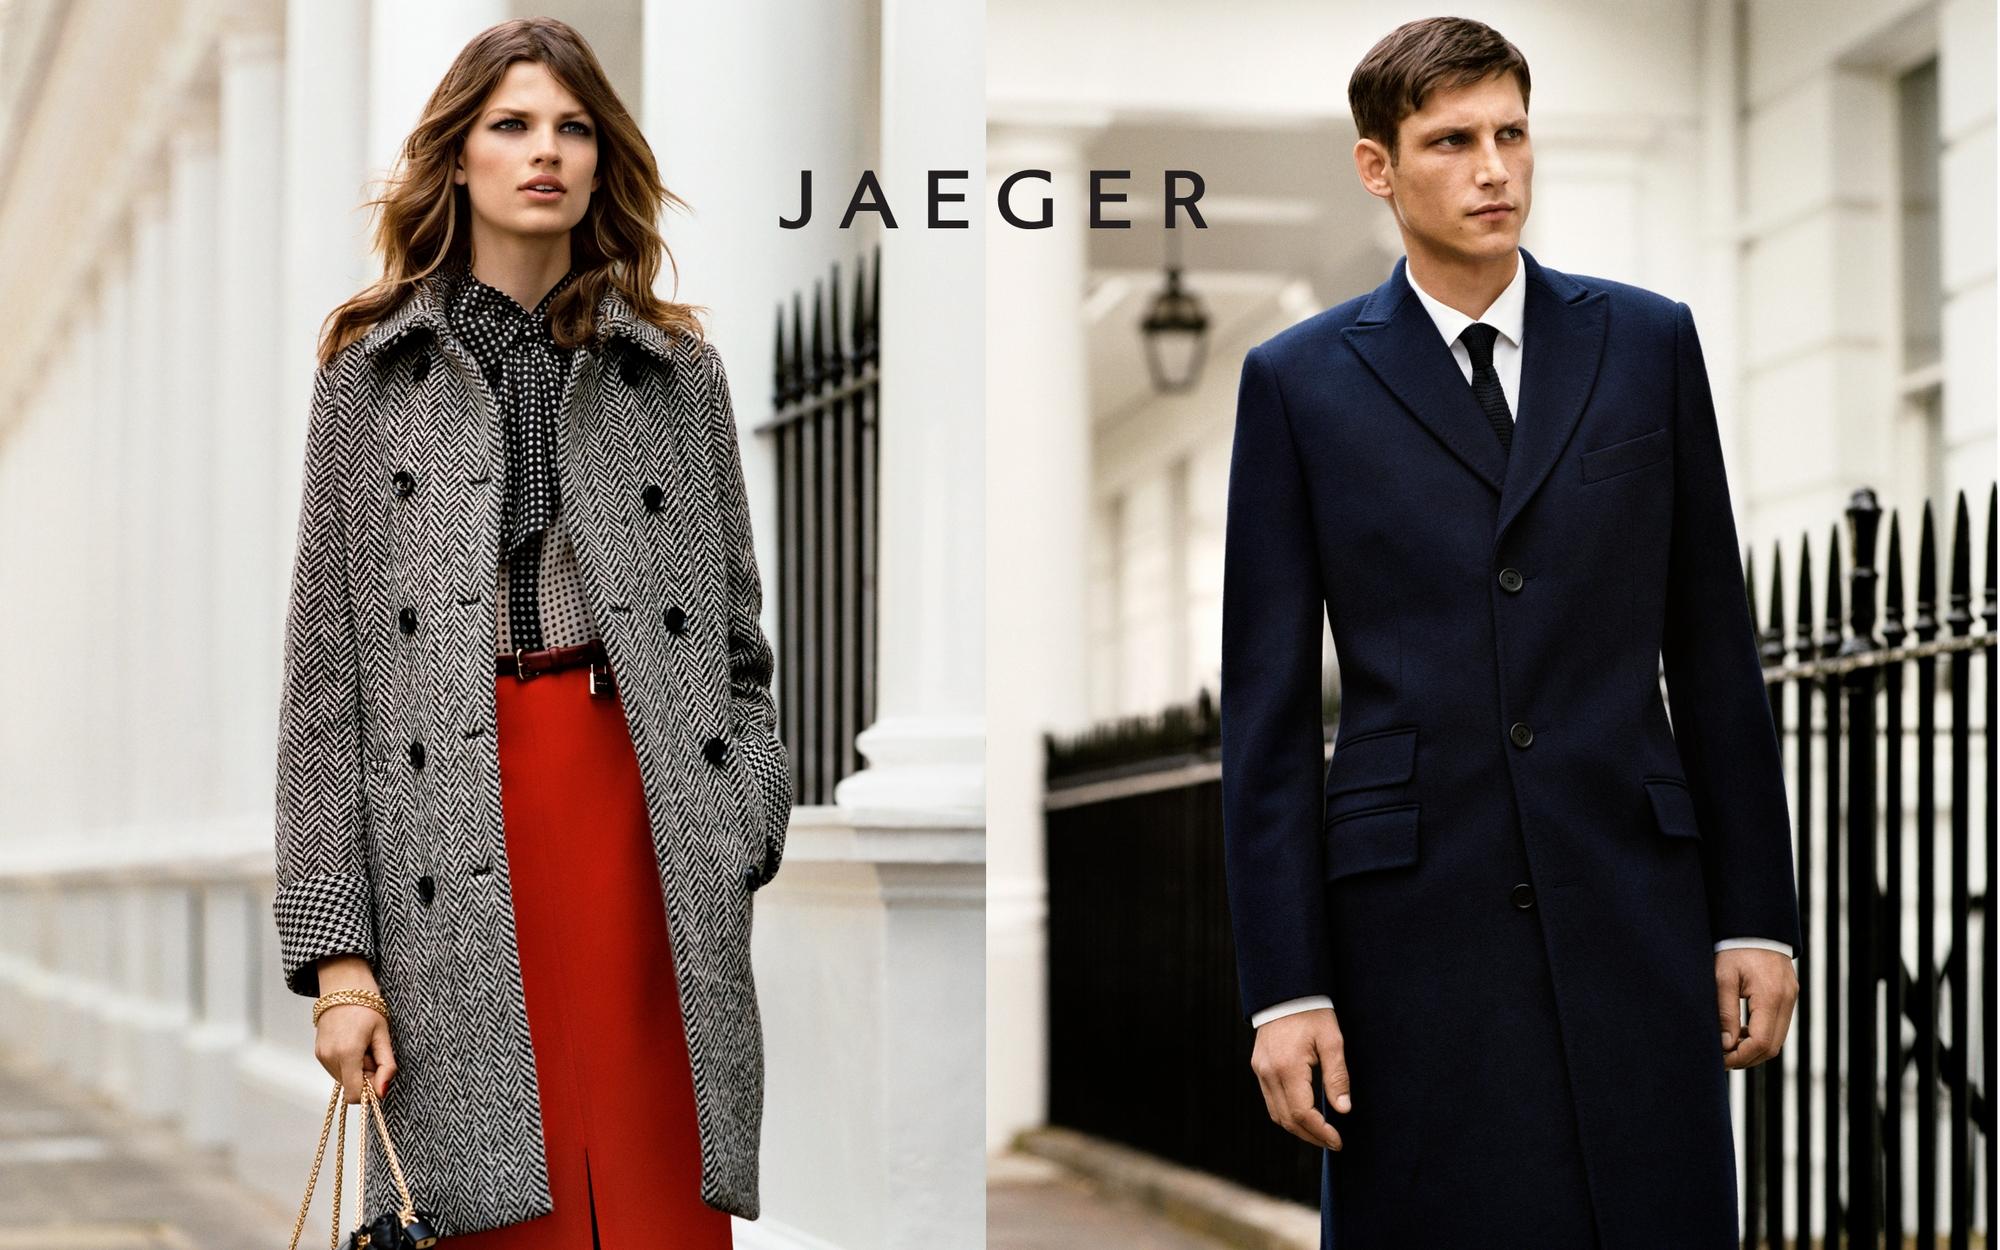 Timeline: A recent history of Jaeger